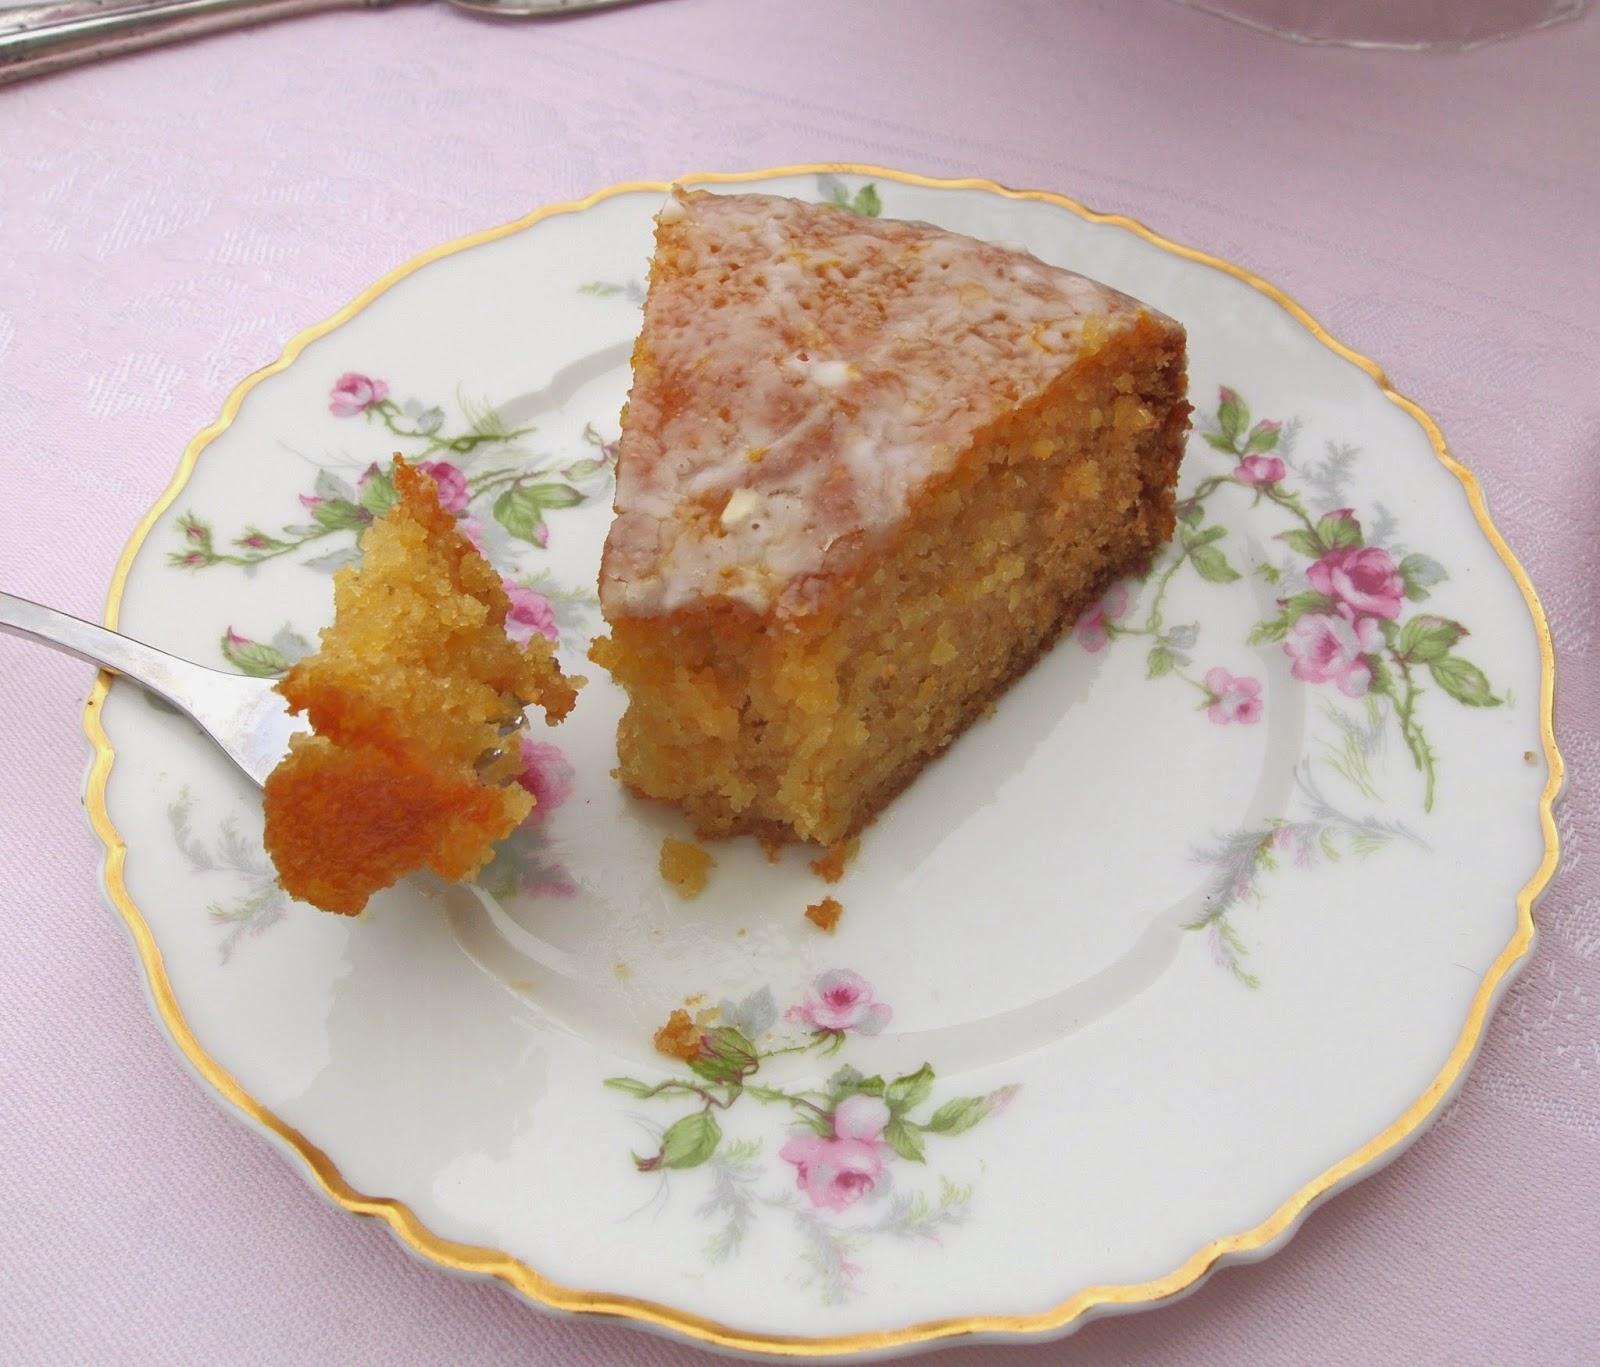 Lemon Pineapple Upside Down Cake Recipe